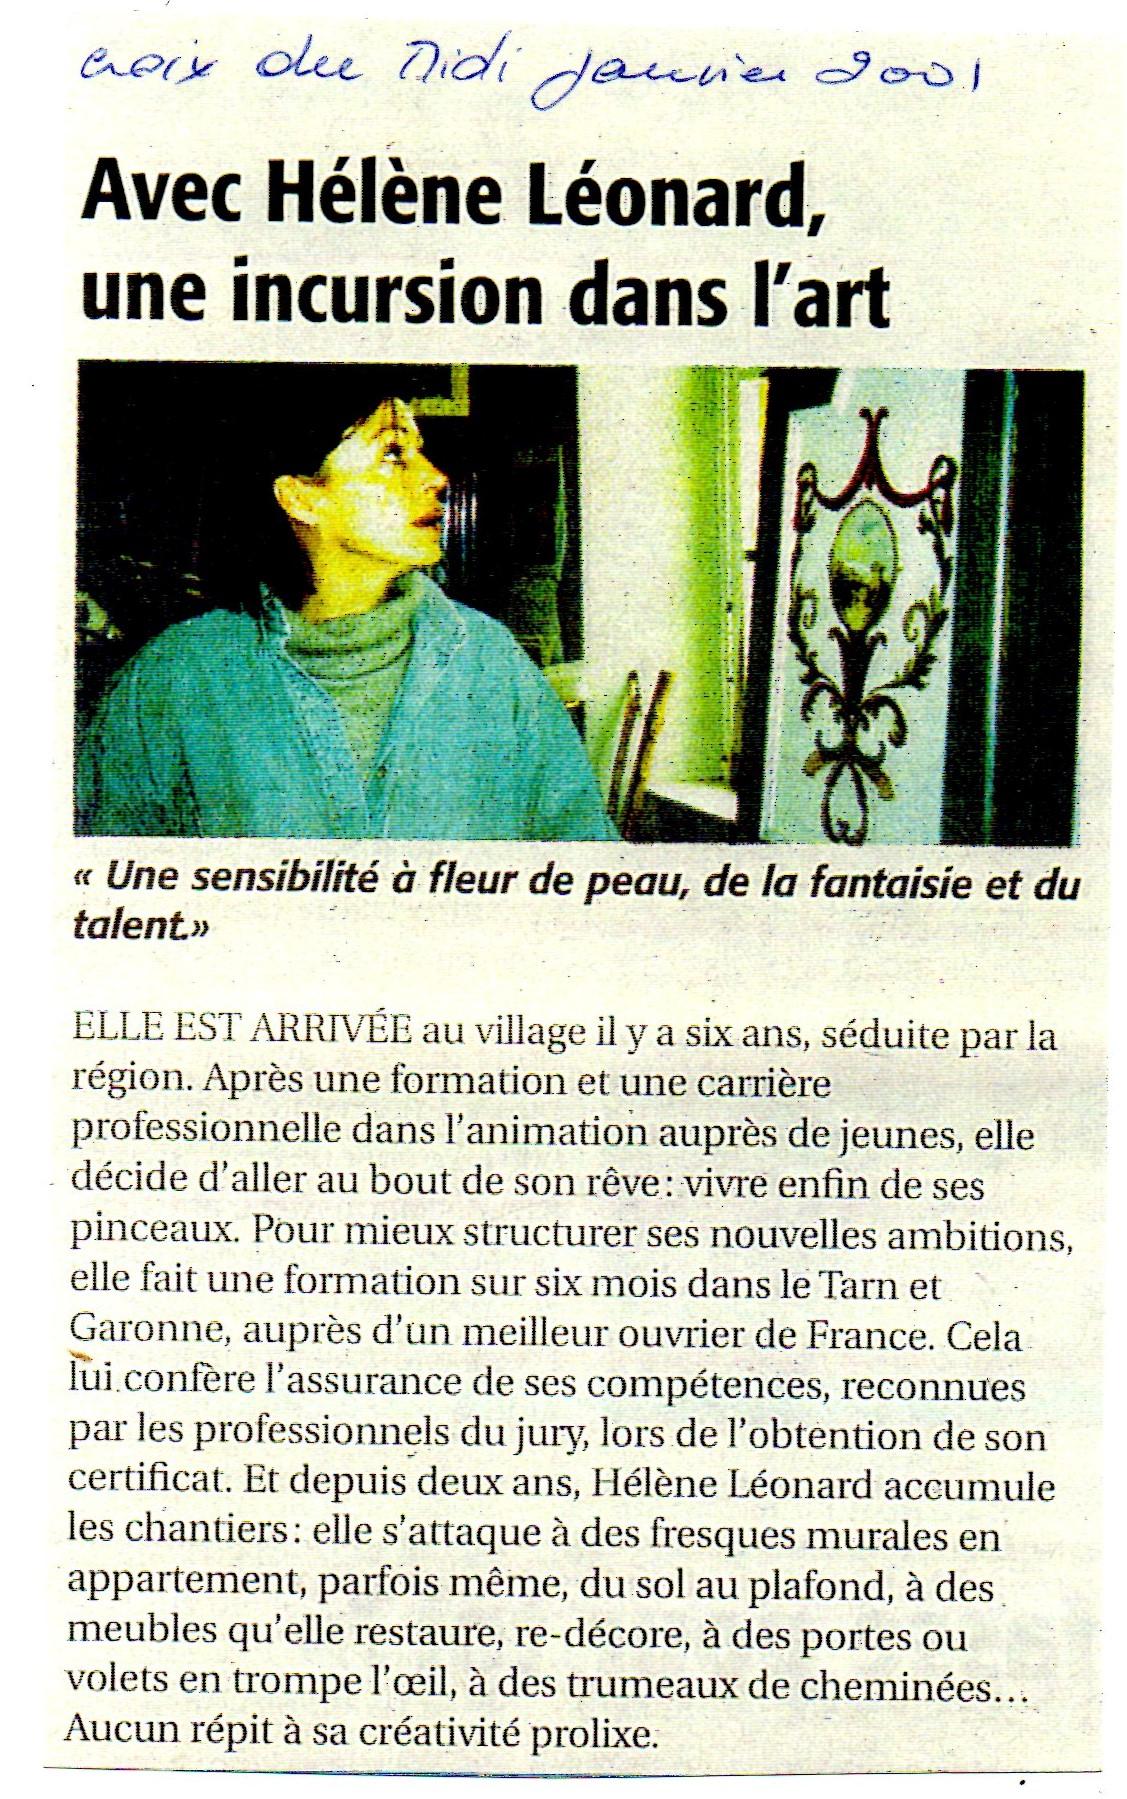 Article croix du midi 2001